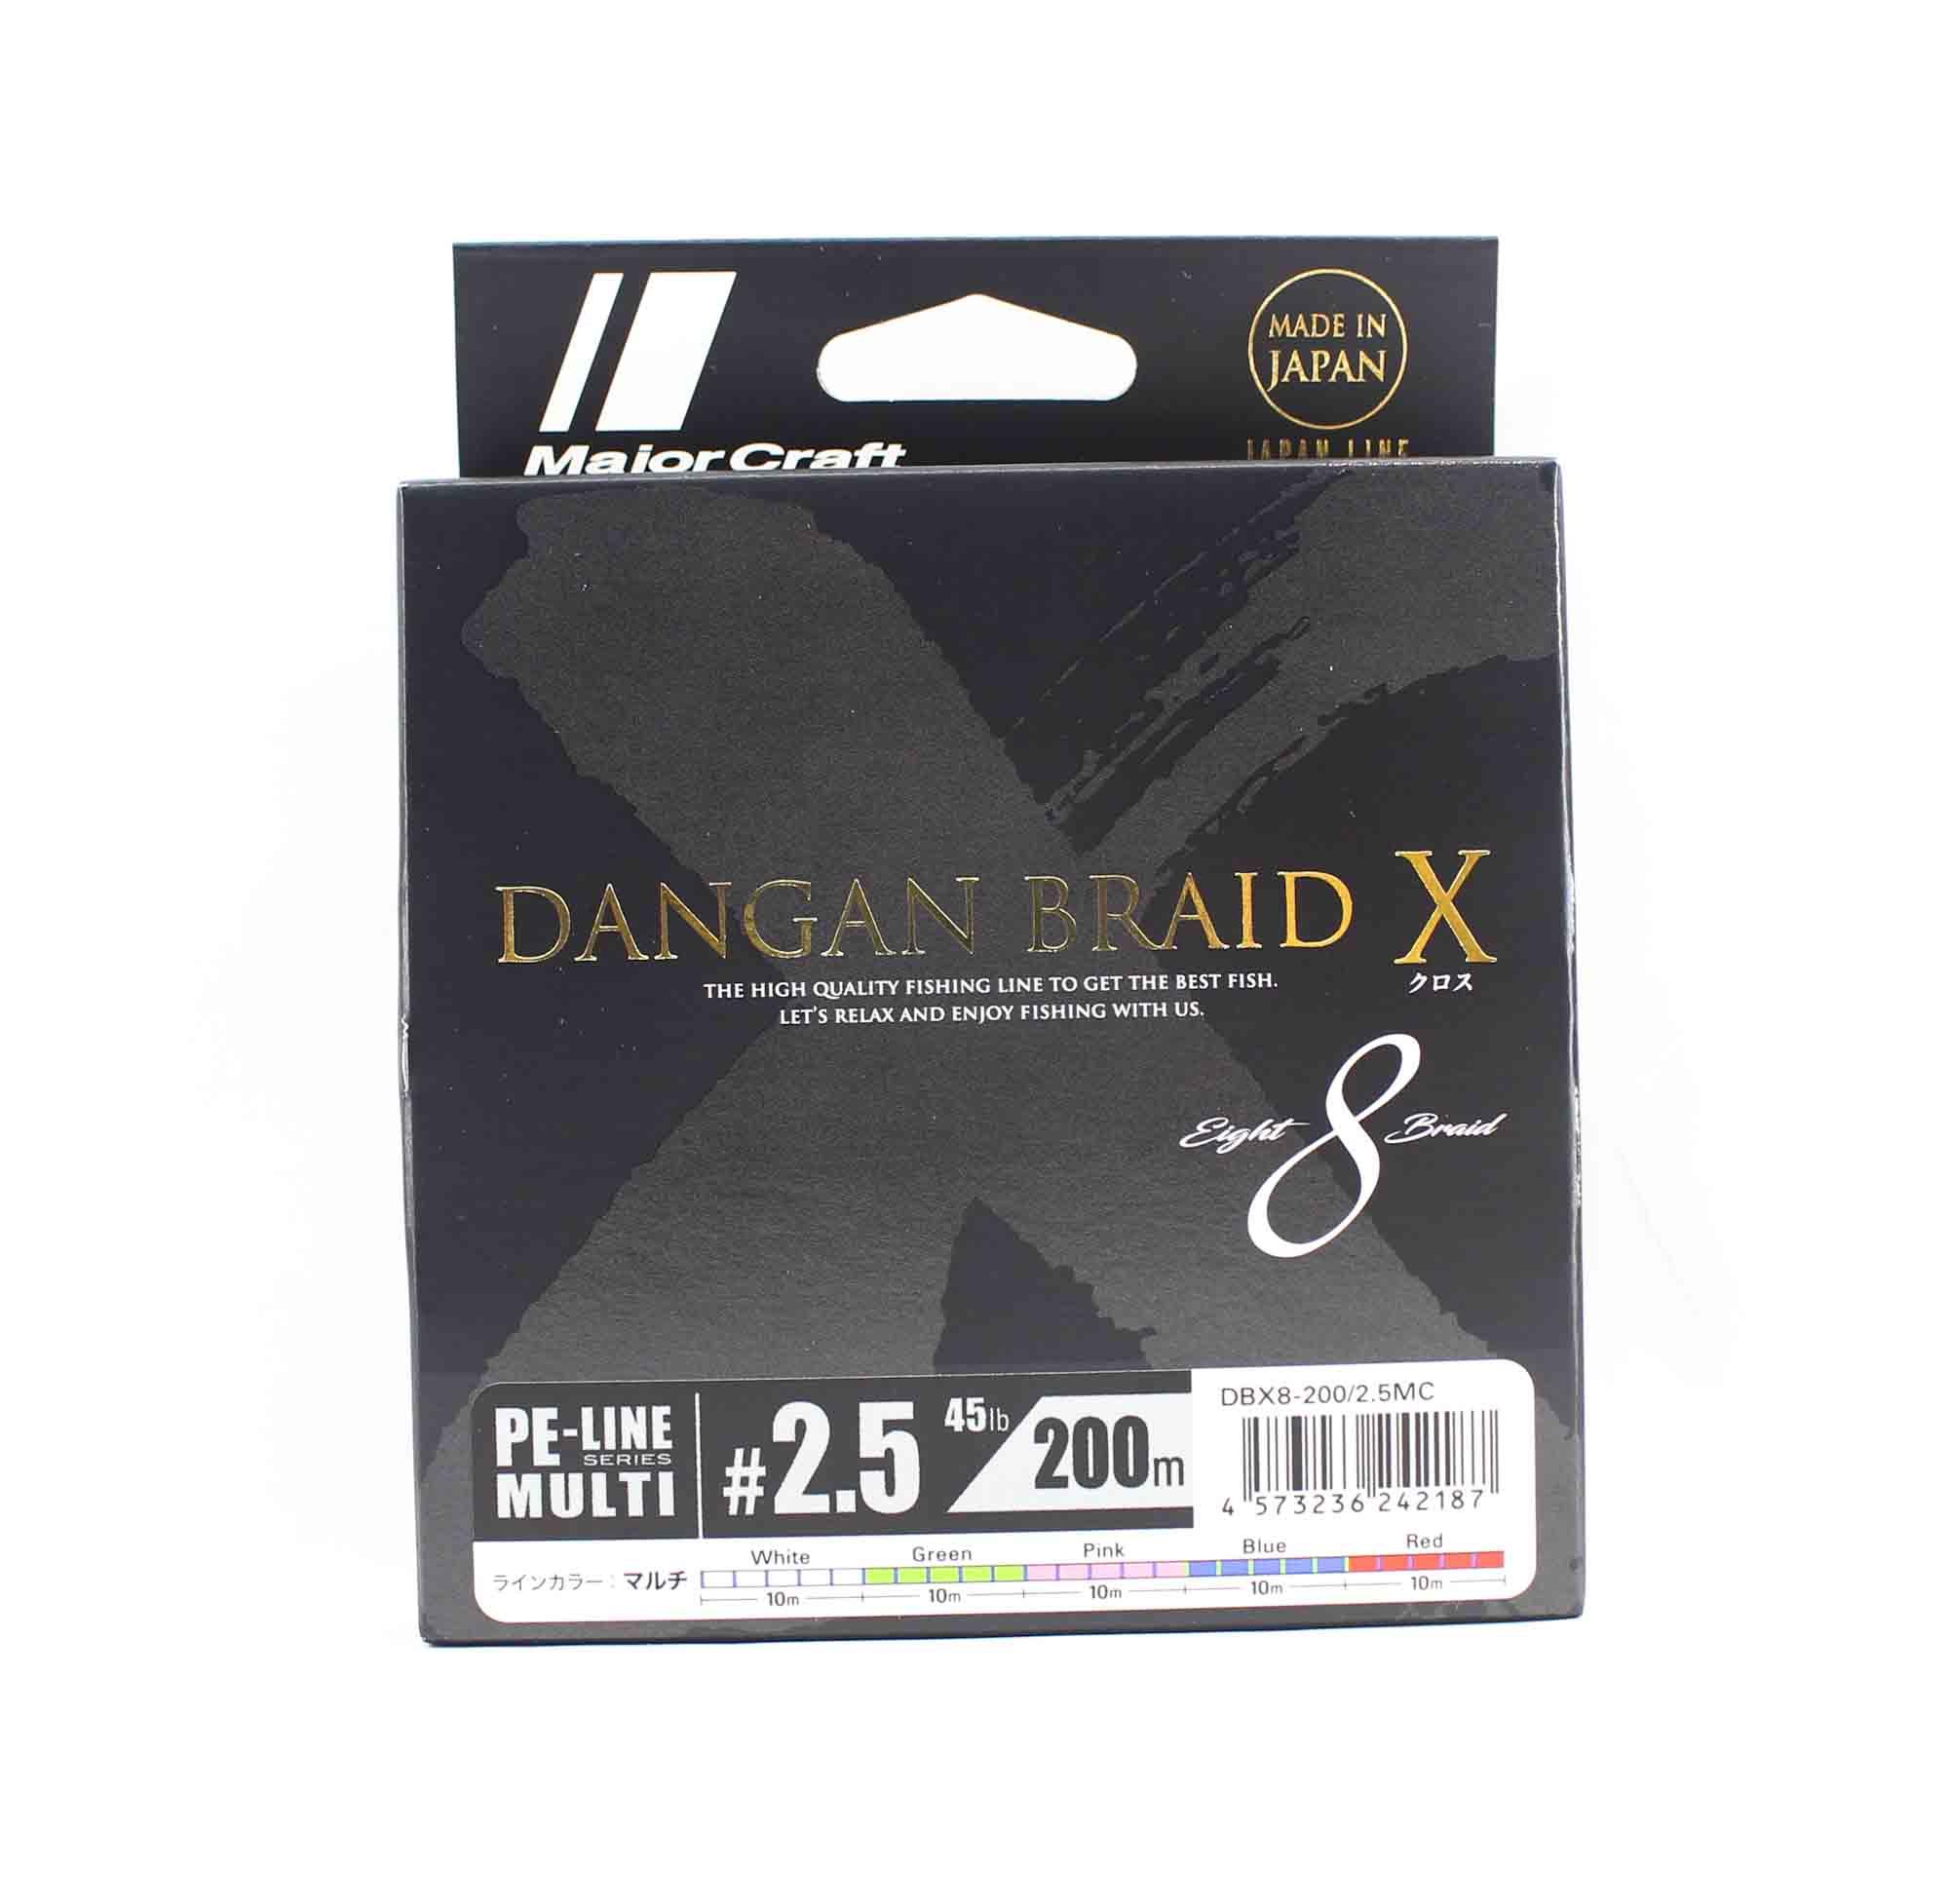 Major Craft Dangan Braid X Line X8 200m P.E 2.5 Multi DBX8-200/2.5MC (2187)